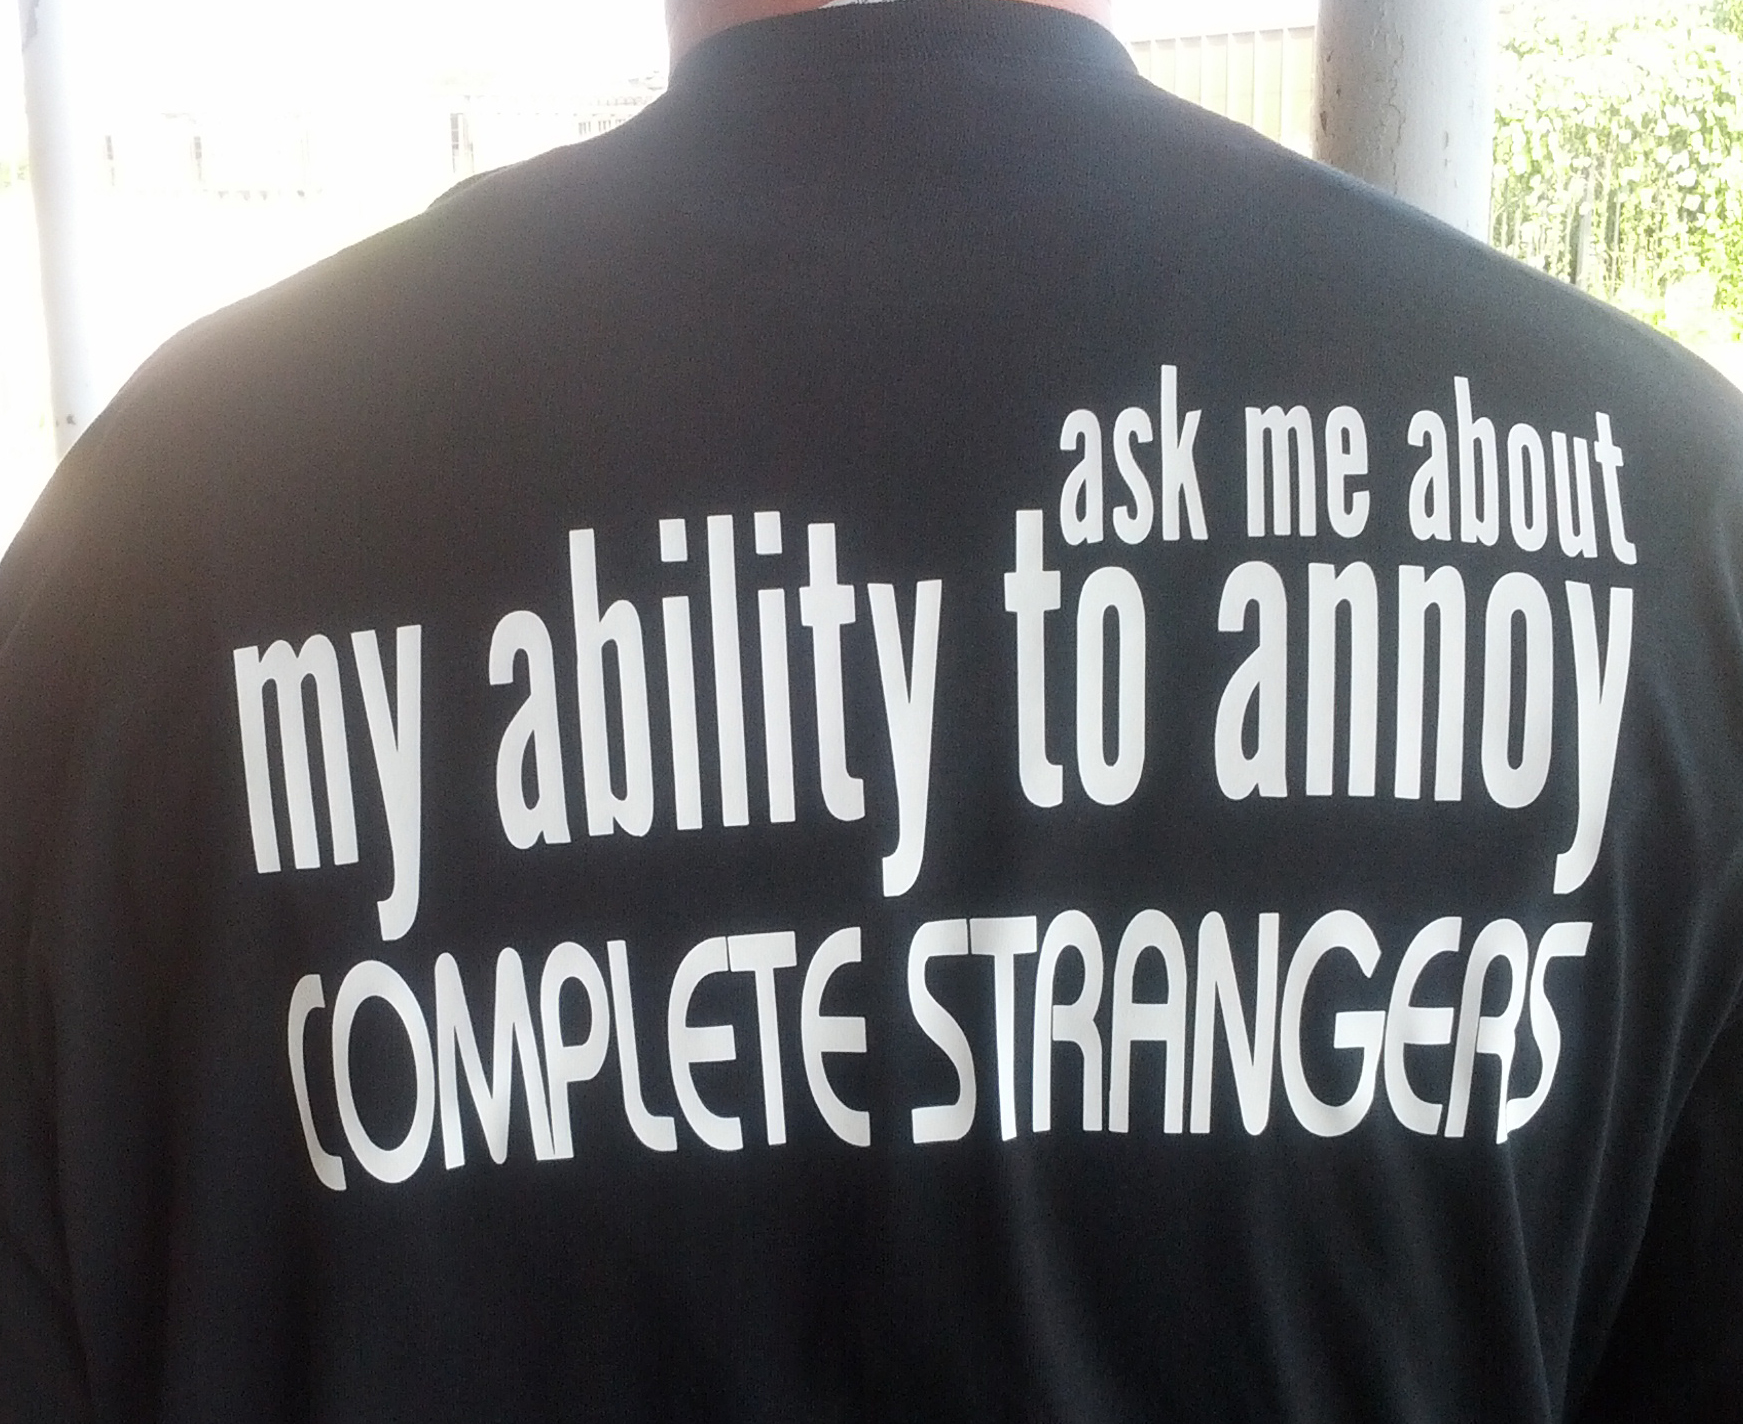 annoy-complete-strangers.jpg